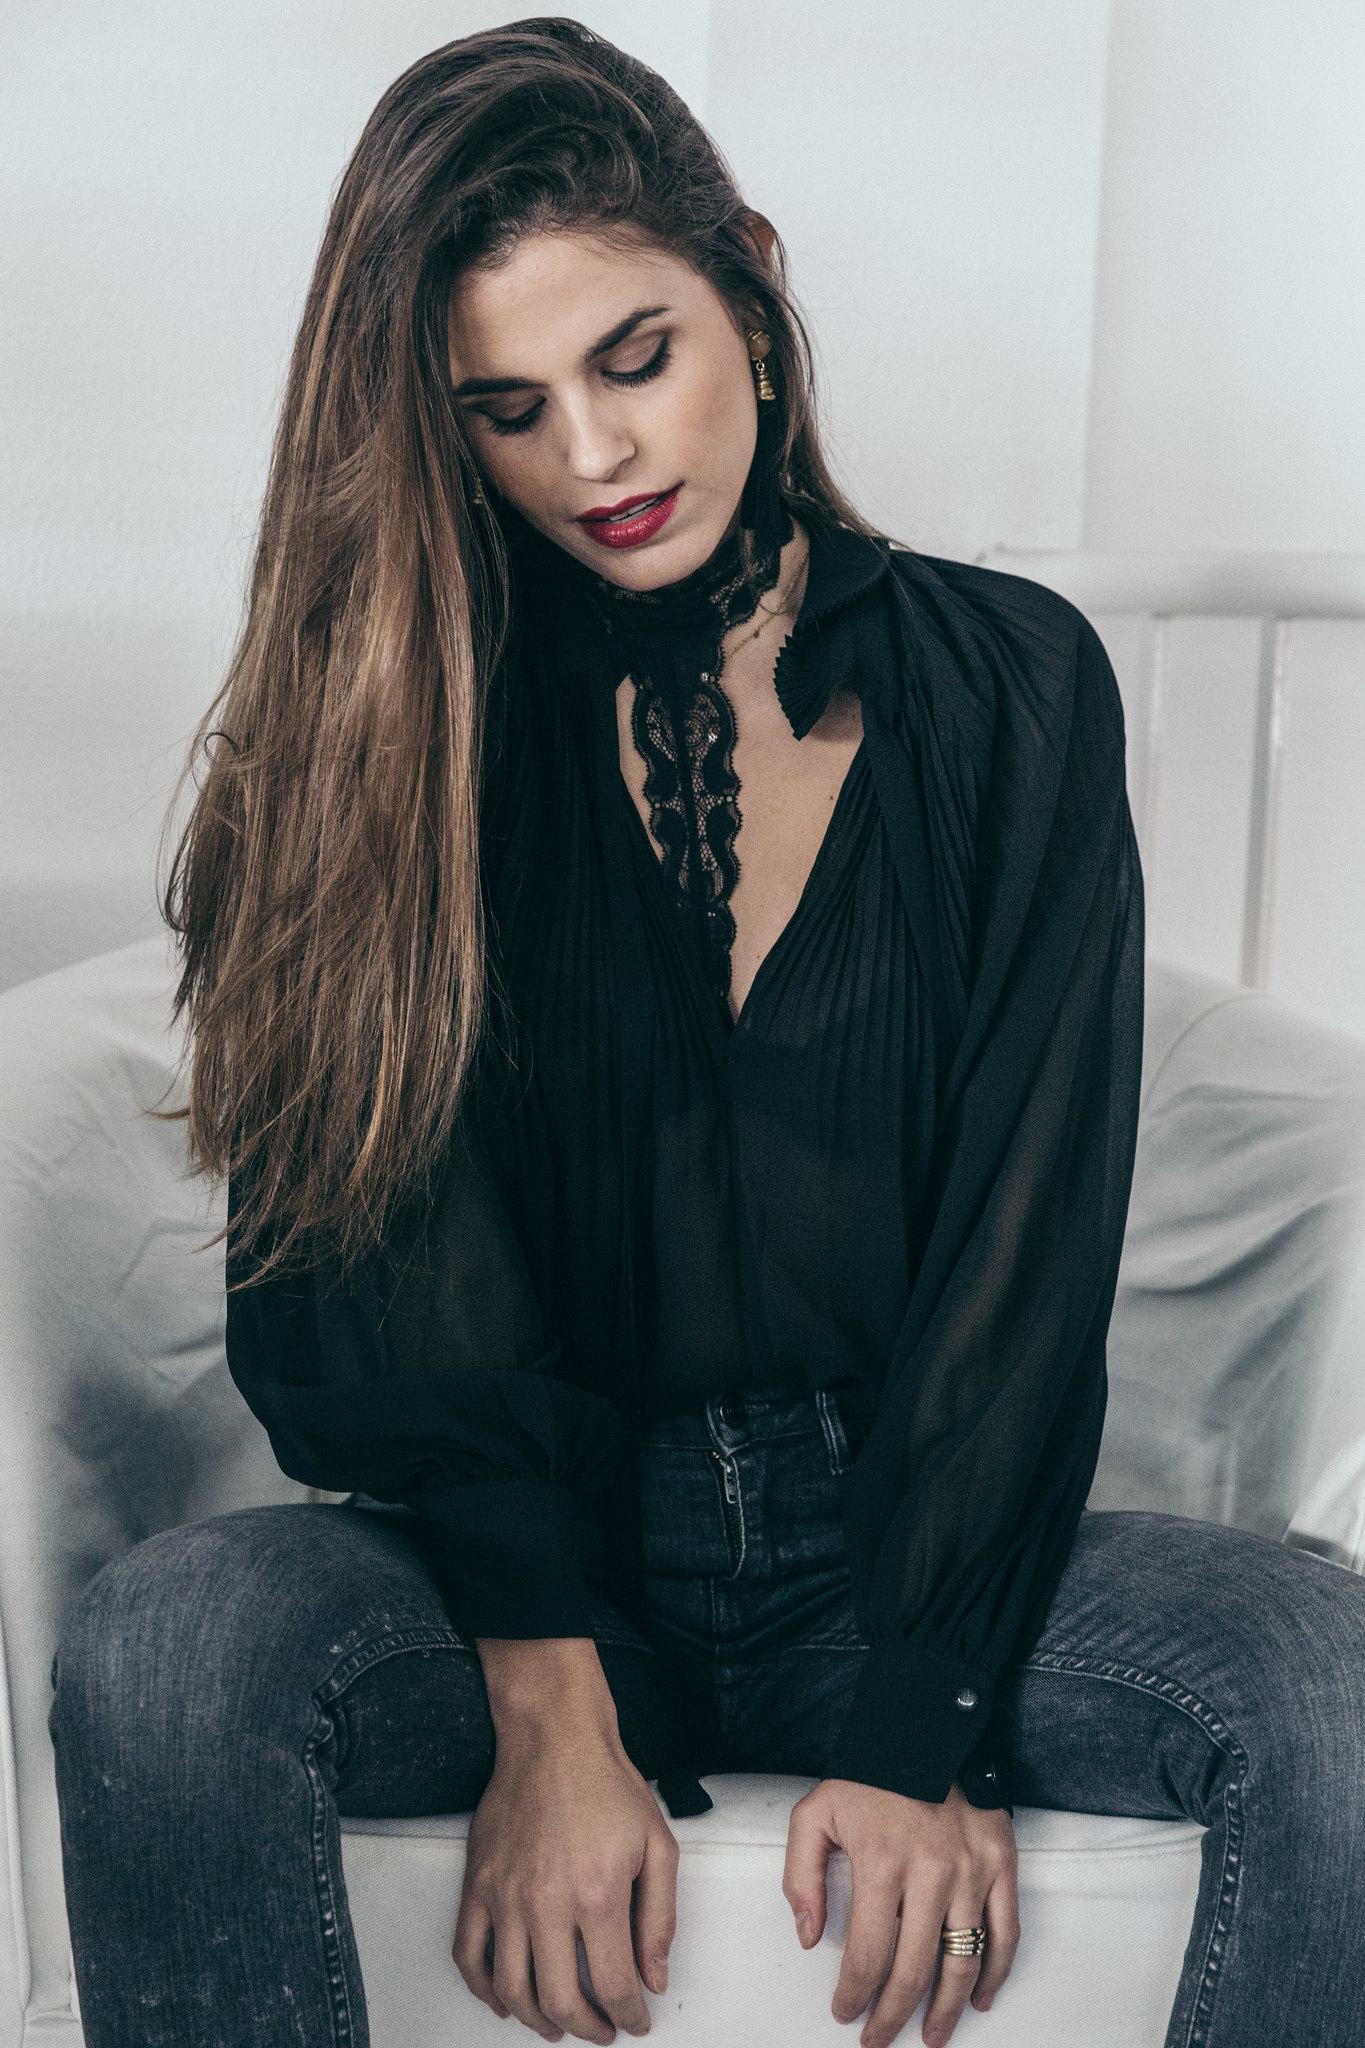 Jessie Chanes - Seams for a desire - WS - Women'secret -14